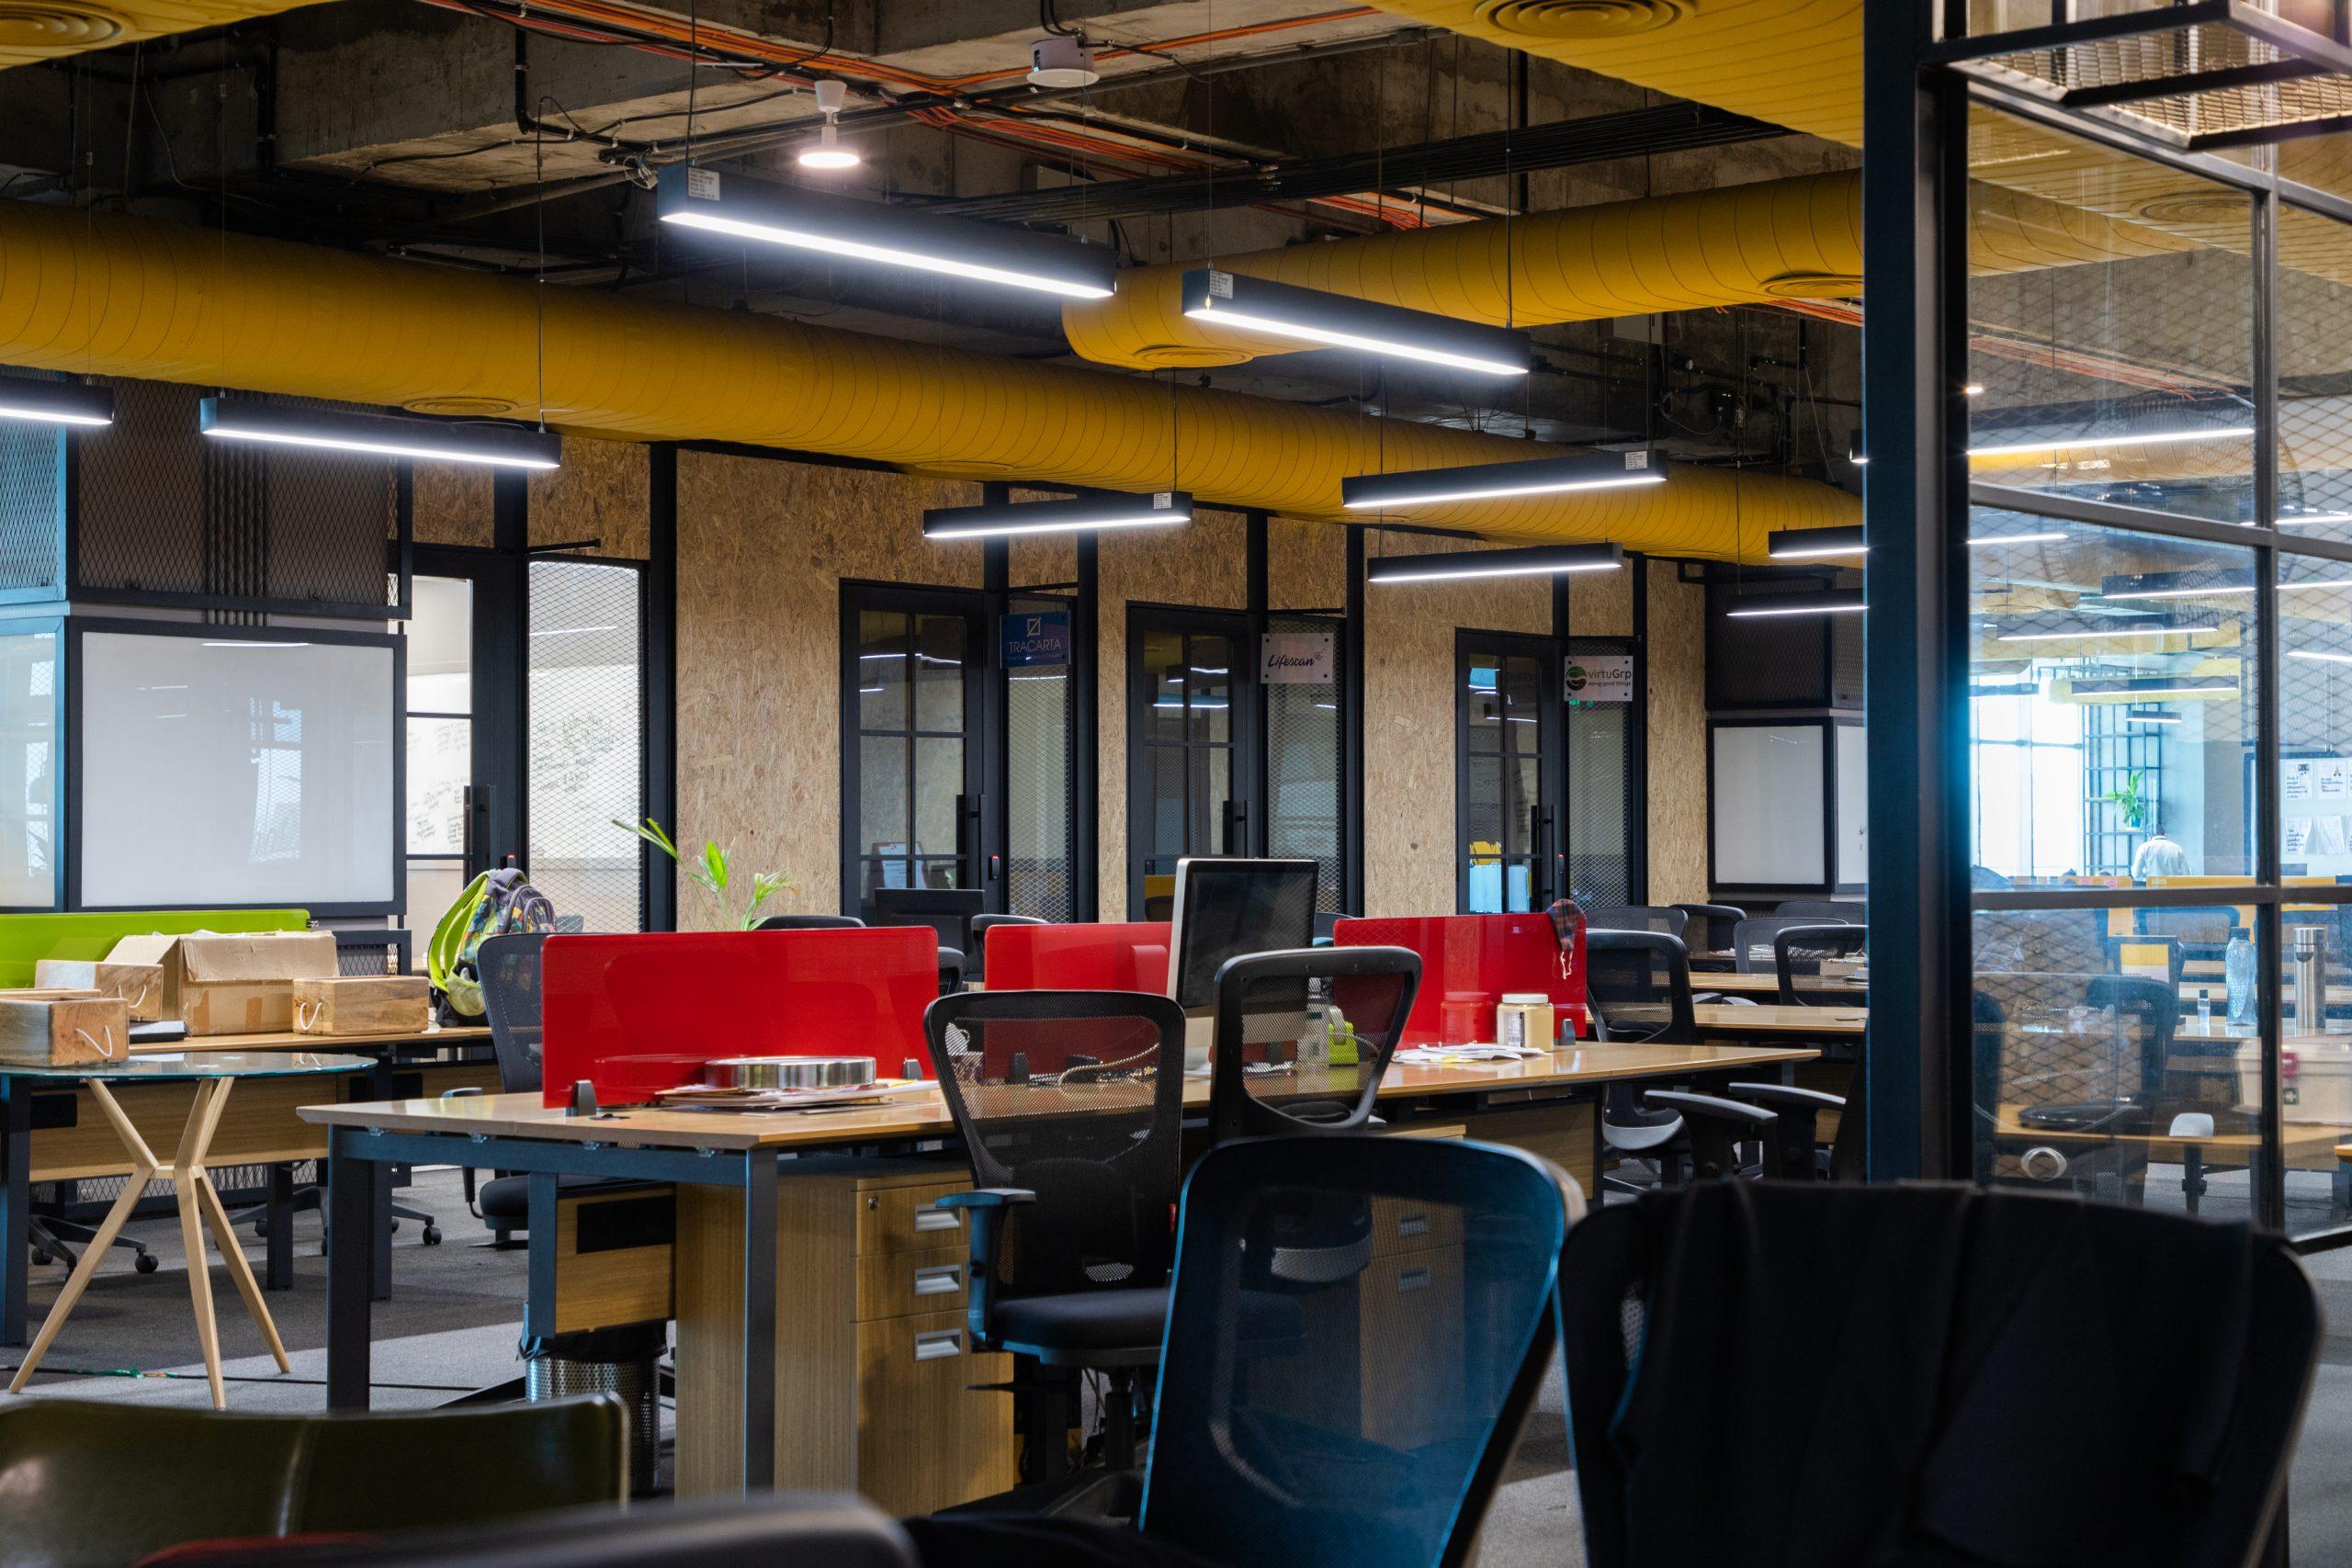 Modern looking office